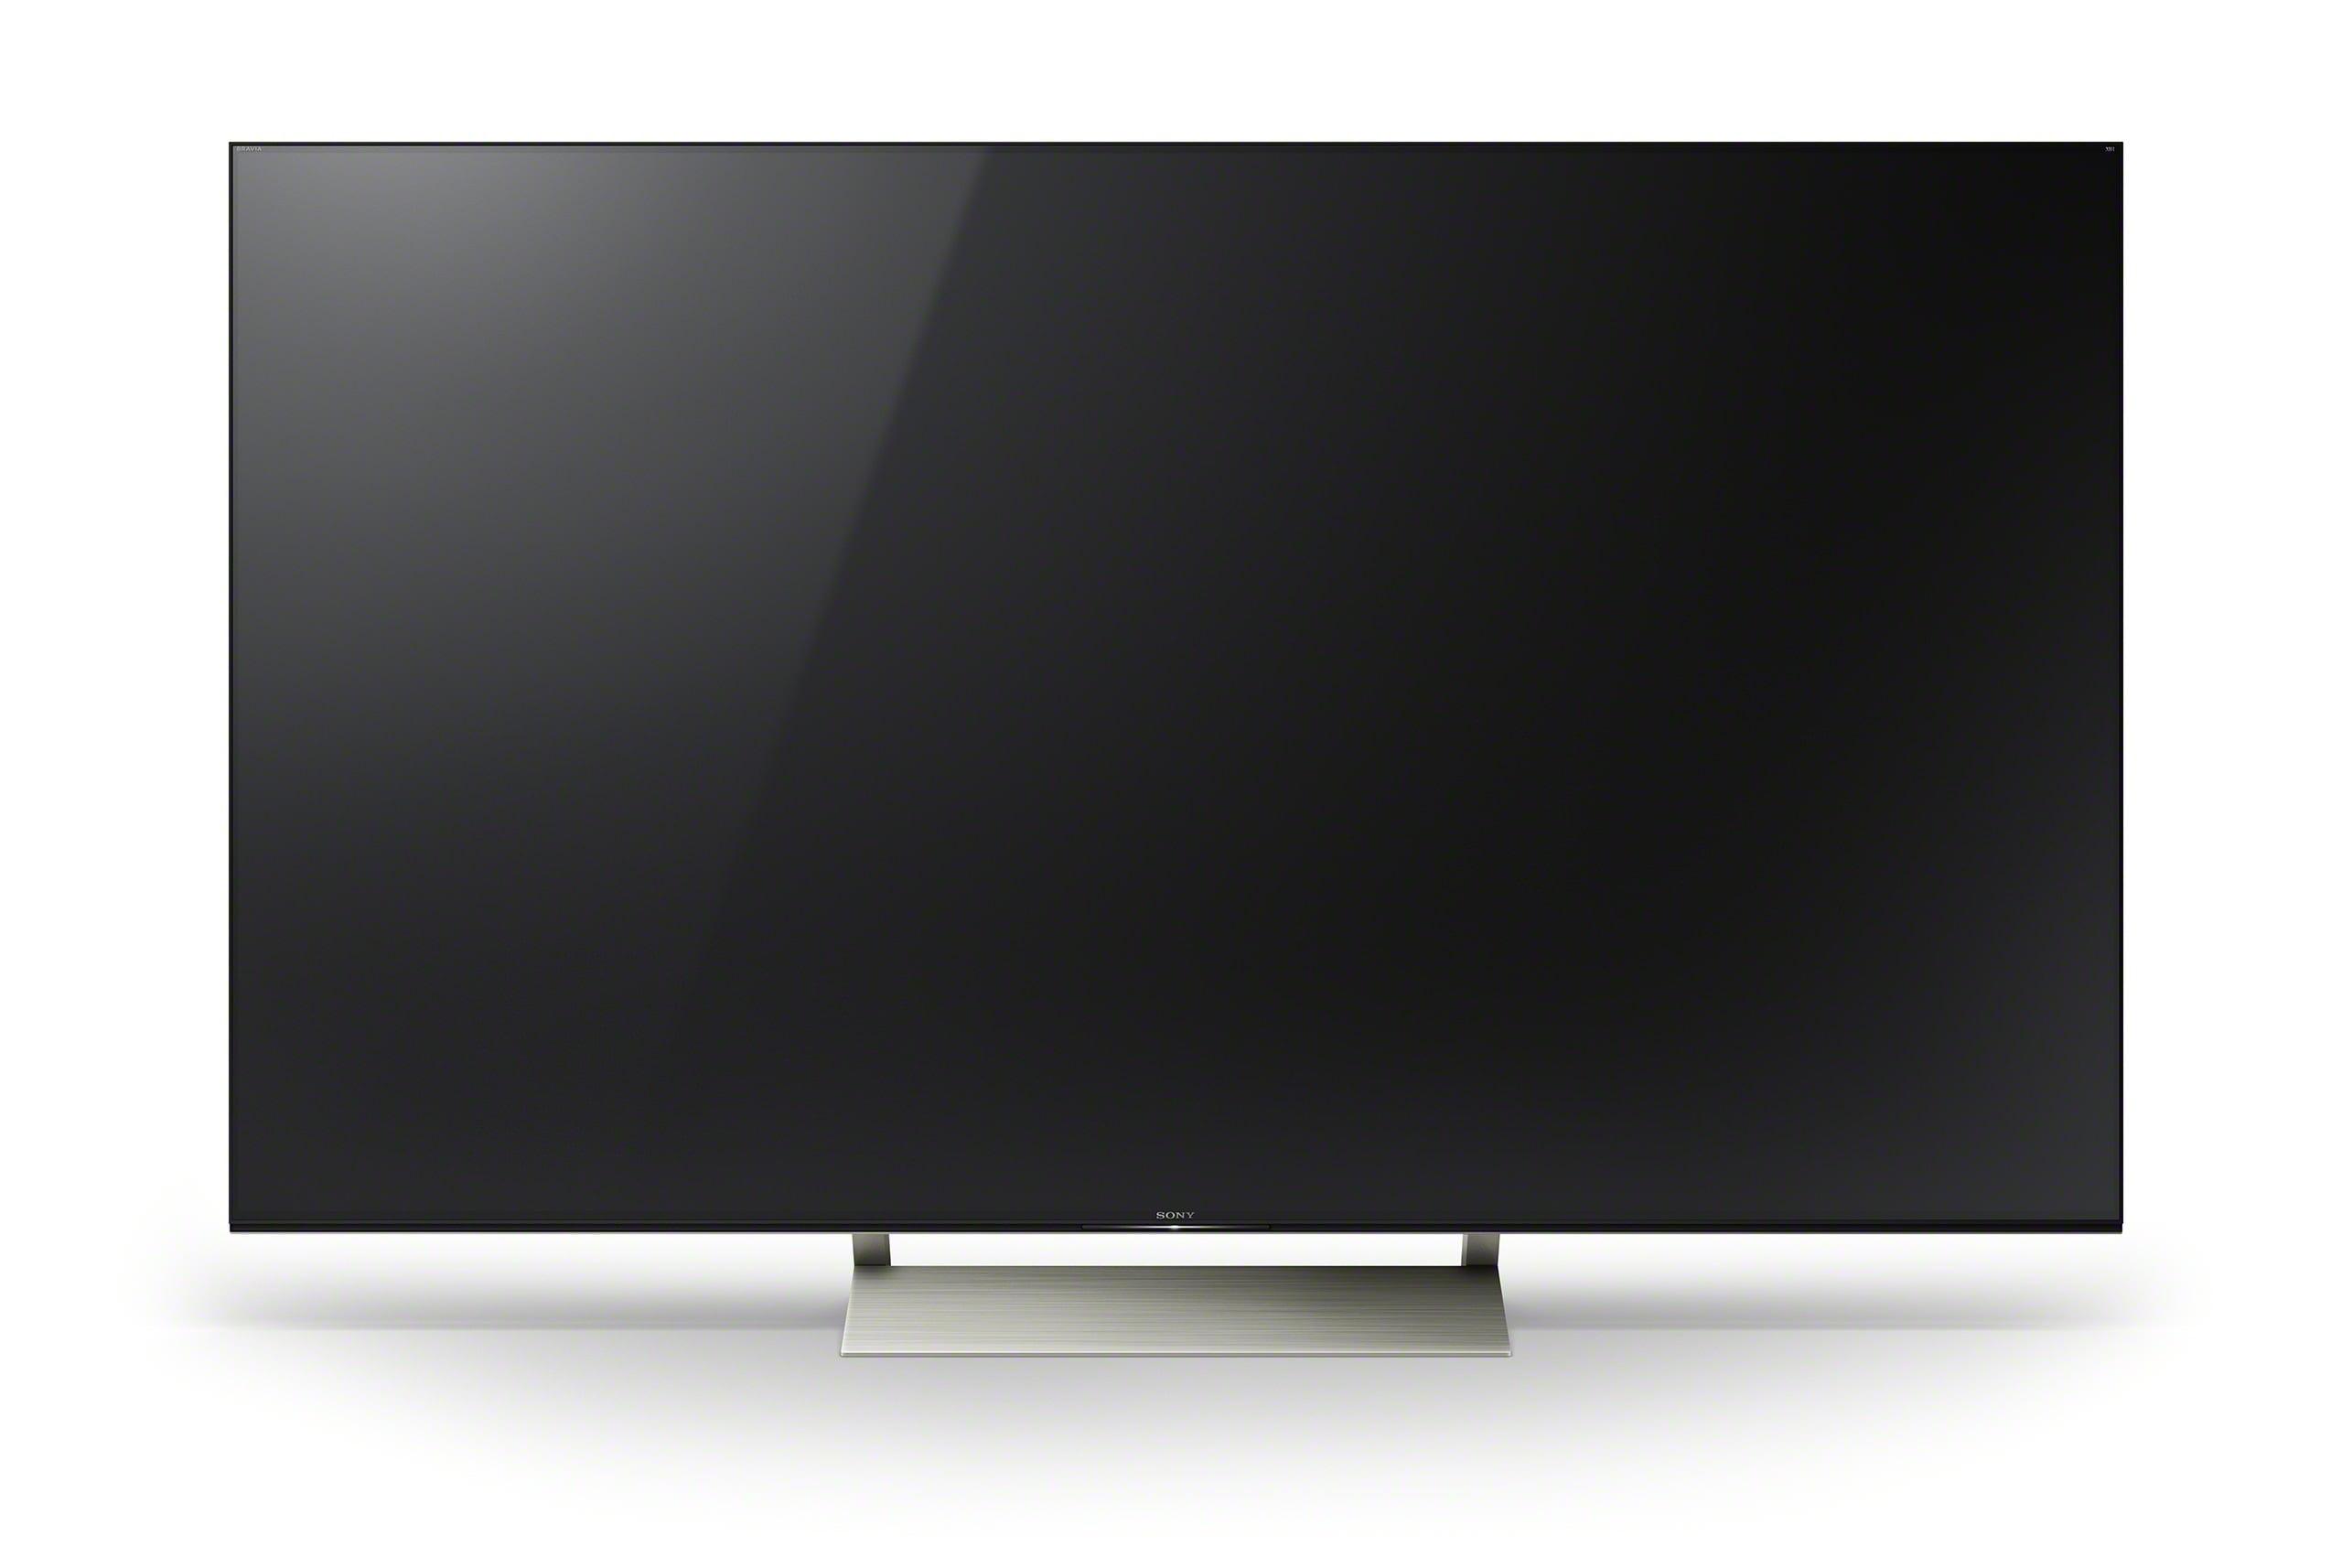 "Sony 65"" Class 4K (2160P) Smart LED TV (XBR65X930E) by Sony"